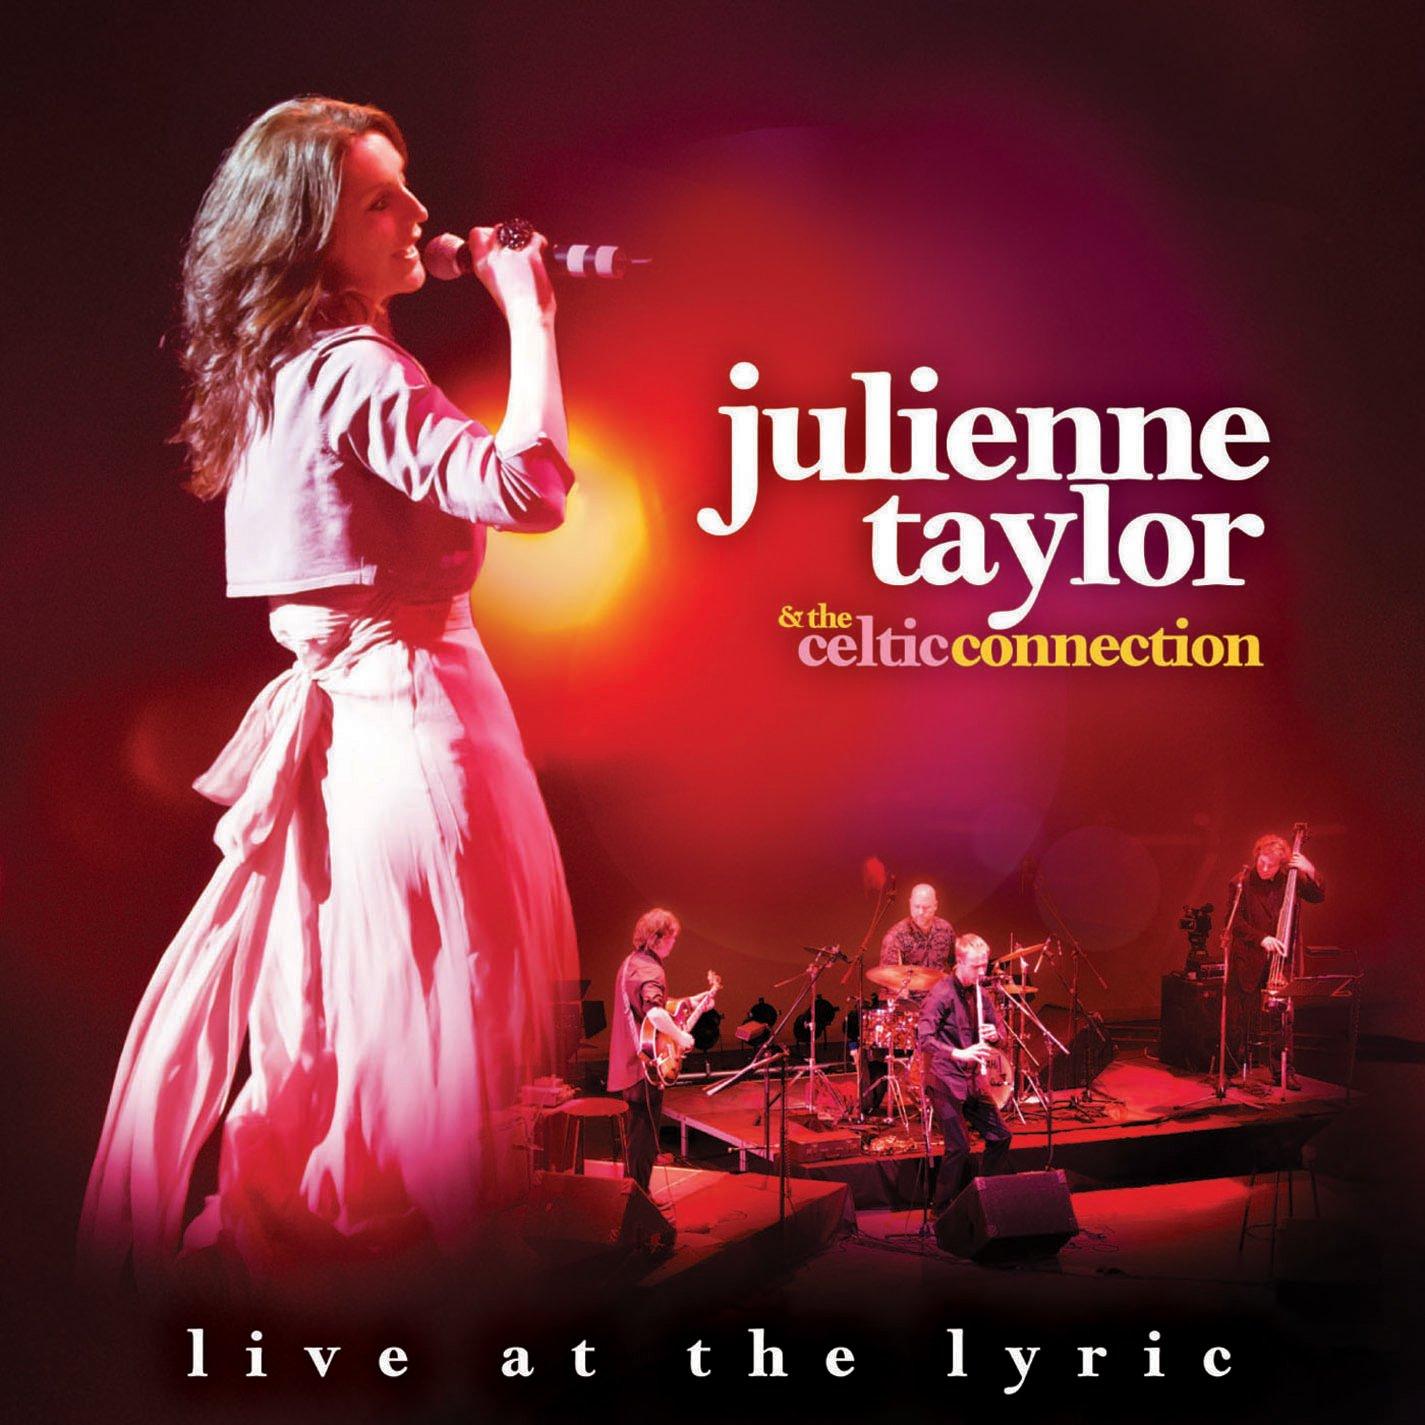 SACD : Julienne Taylor - Live at Thelyric (SACD)